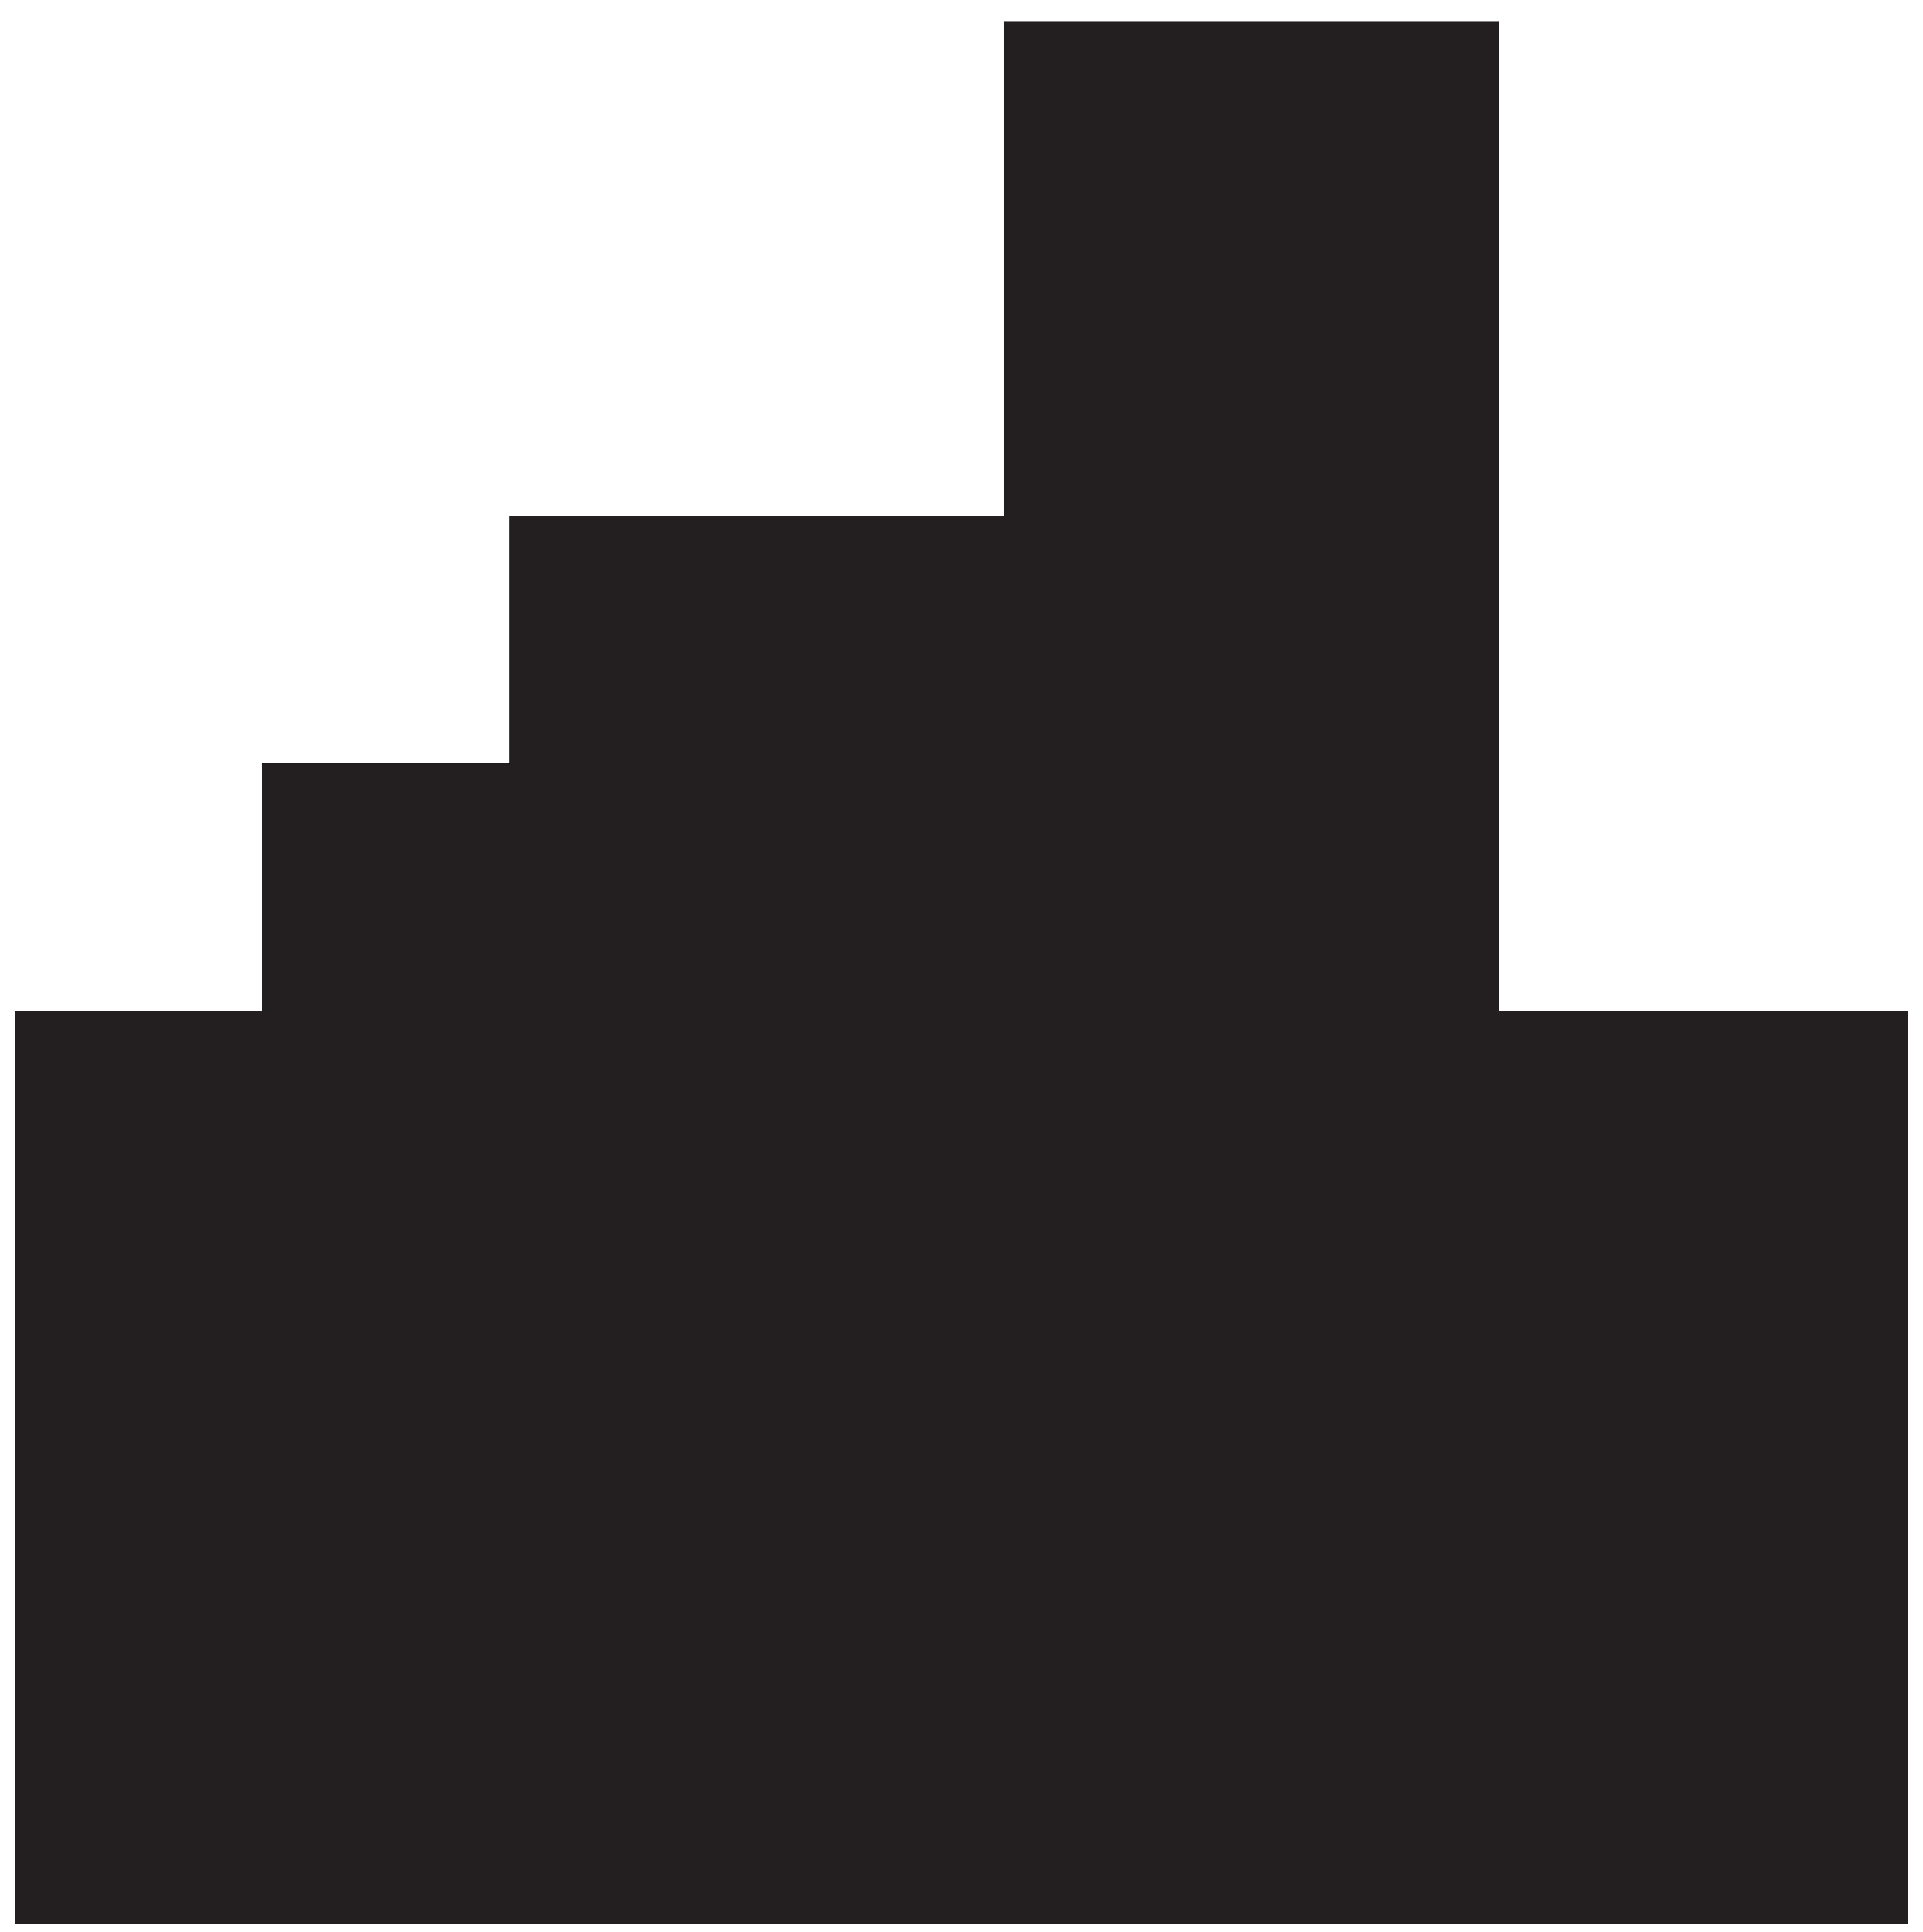 7961x8000 Female Cyclist Silhouette Clip Art Imageu200b Gallery Yopriceville